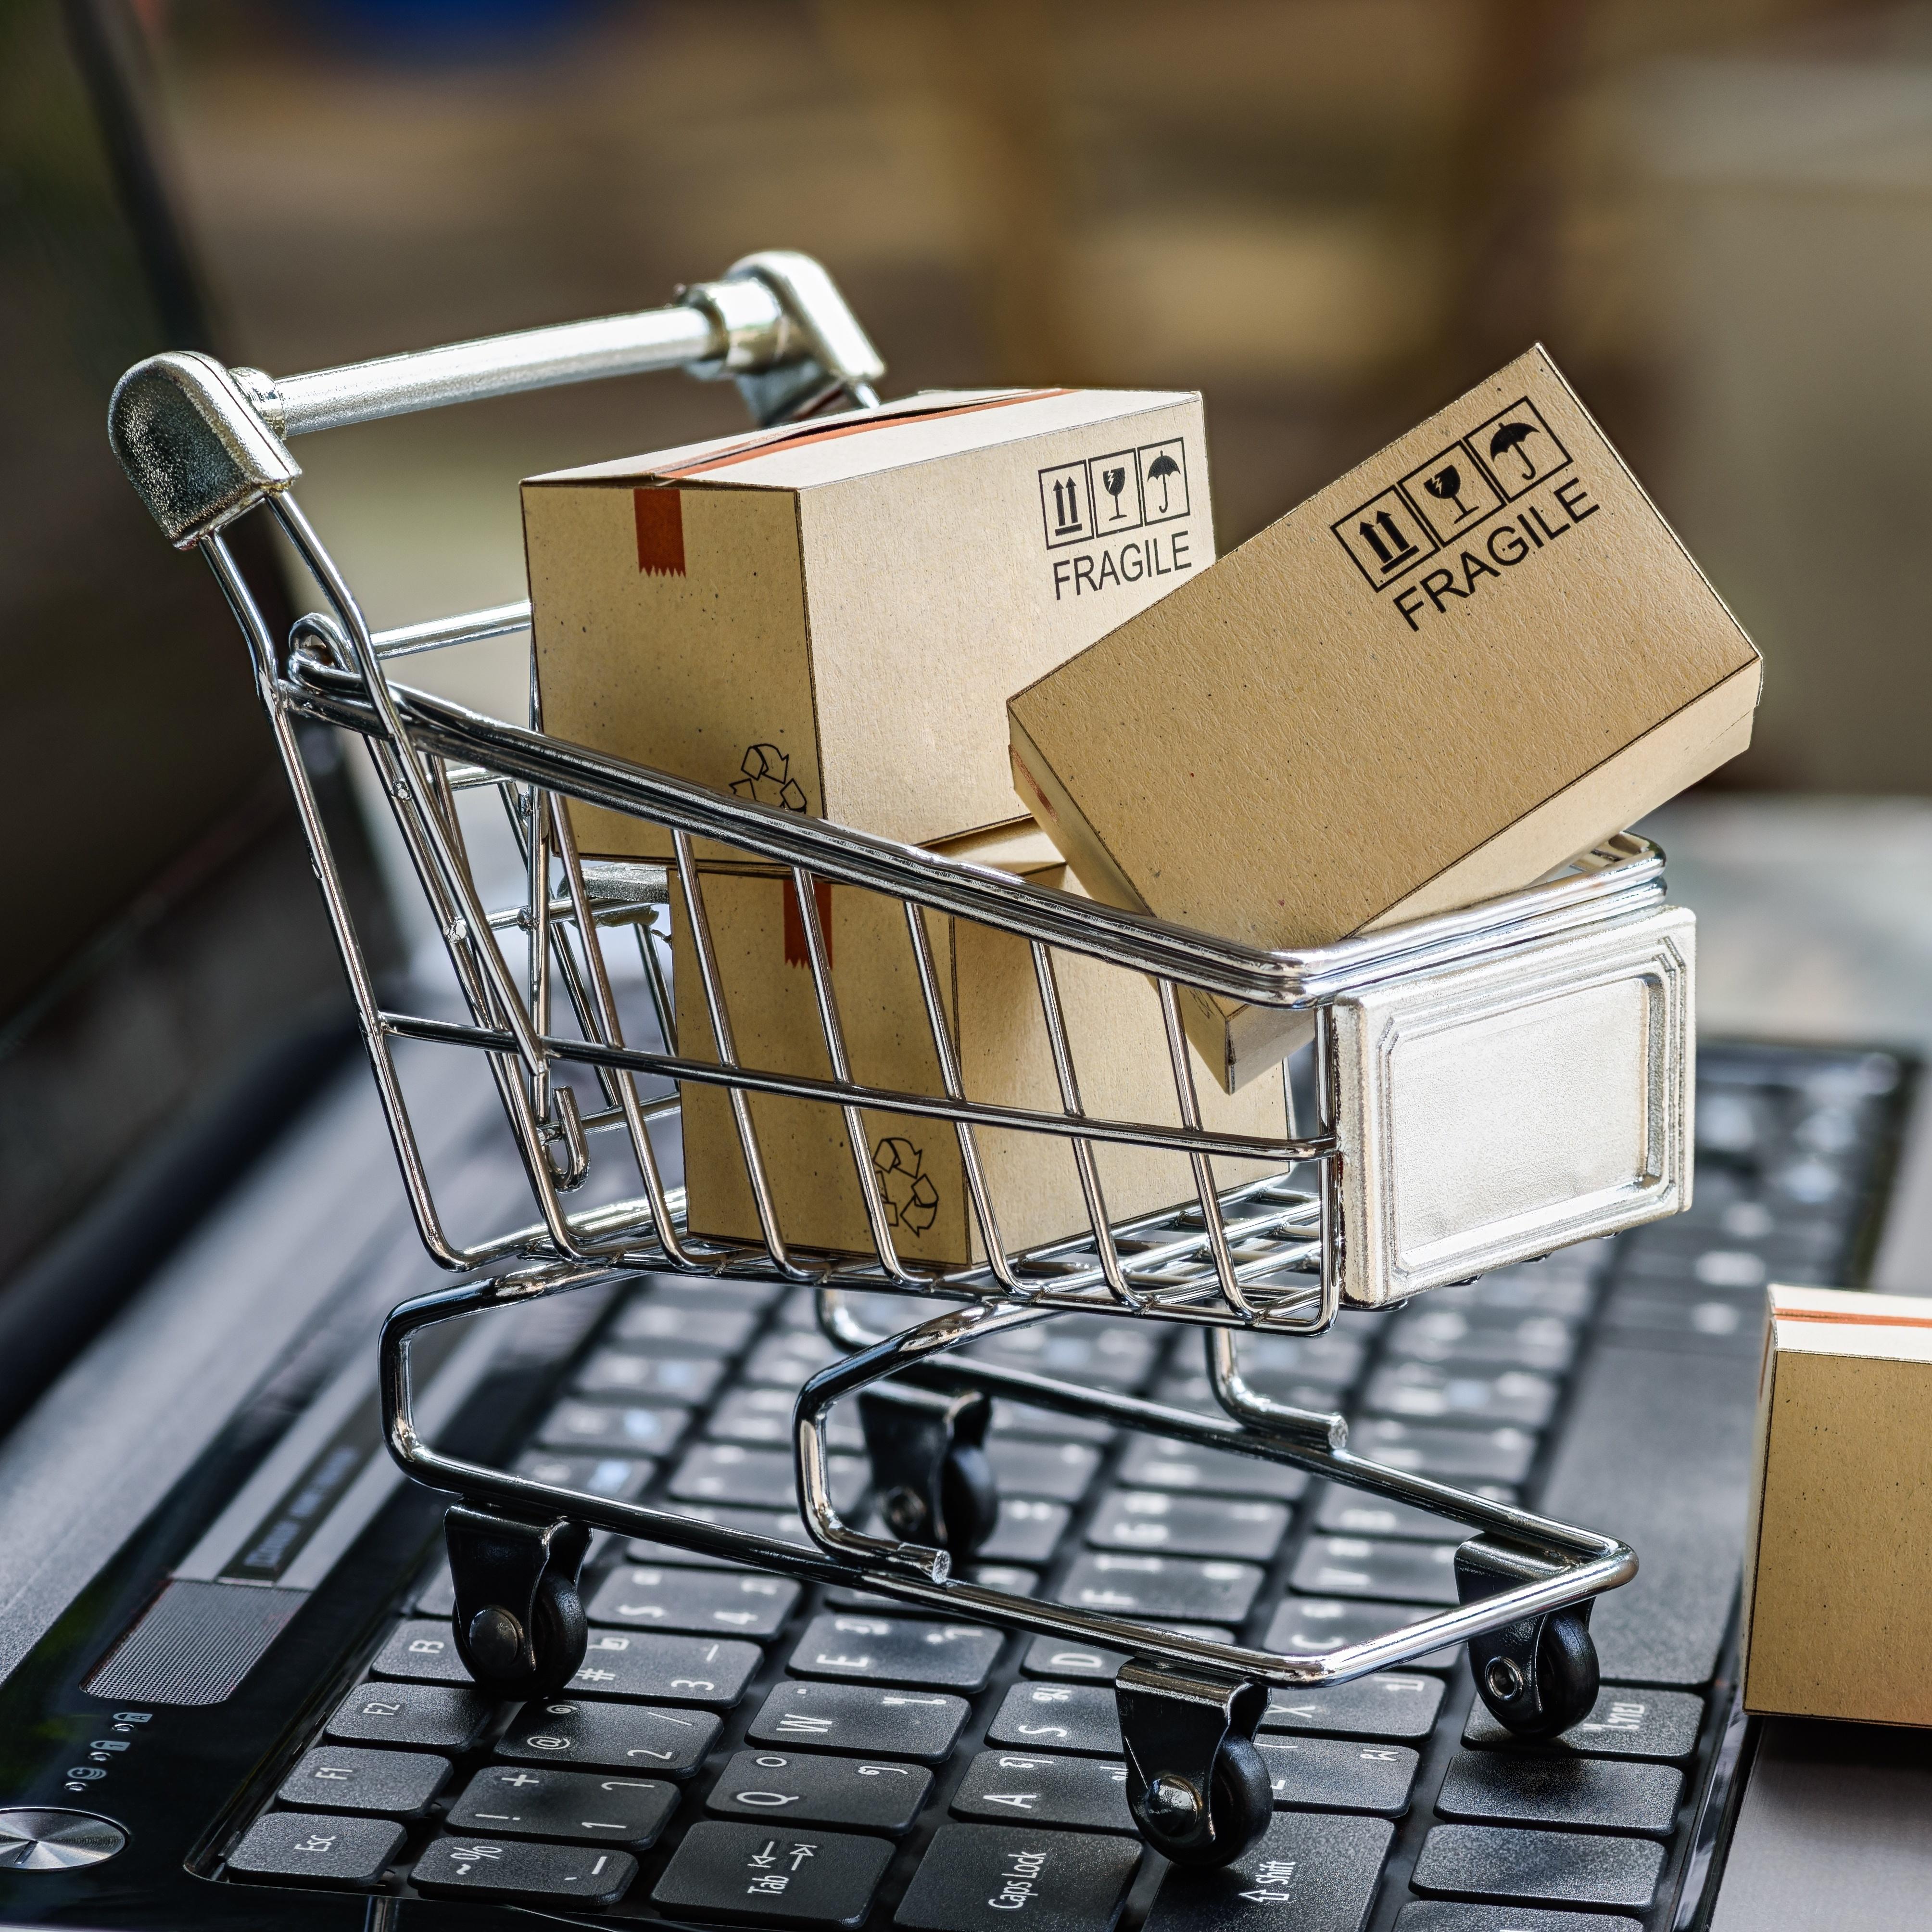 order-processing-inventory-and-logistics-platform